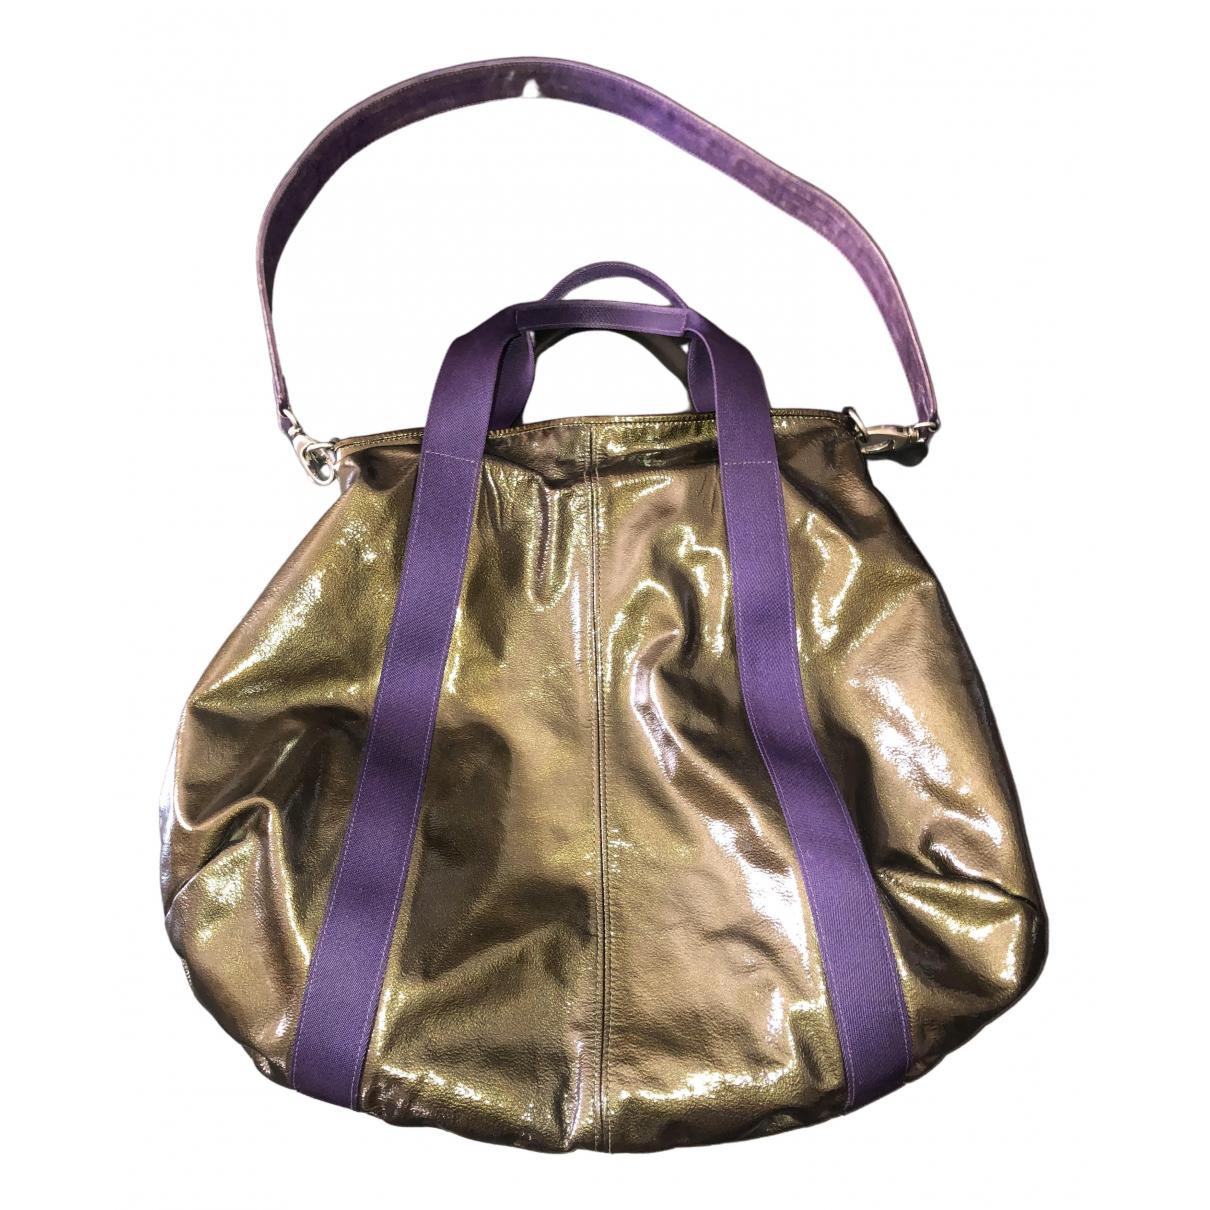 Marni \N Metallic Patent leather handbag for Women \N